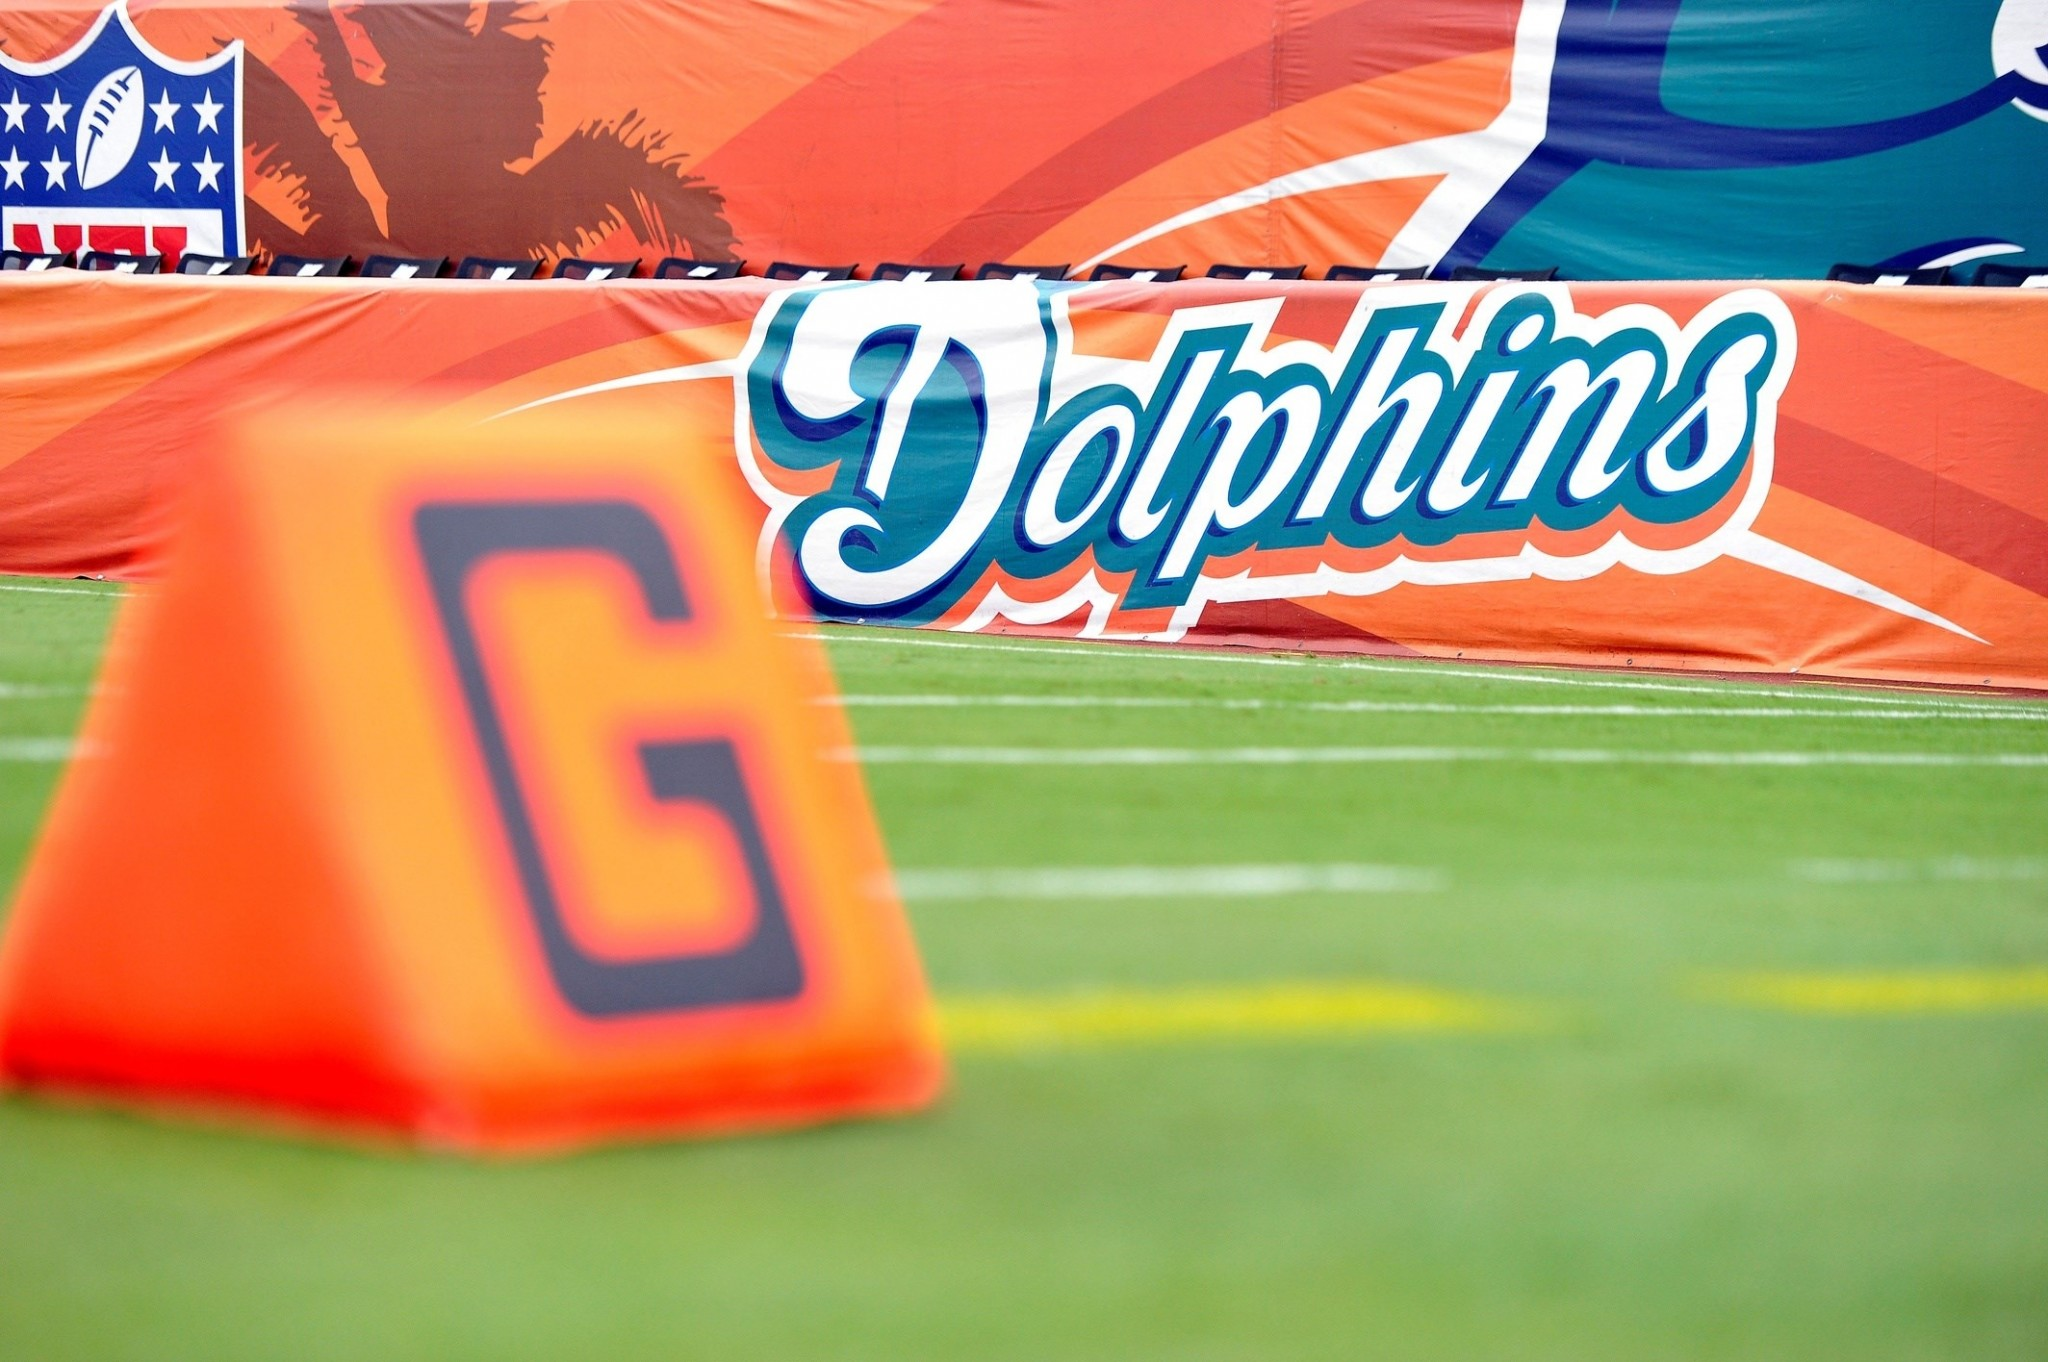 miami dolphins wallpaper desktop backgrounds free